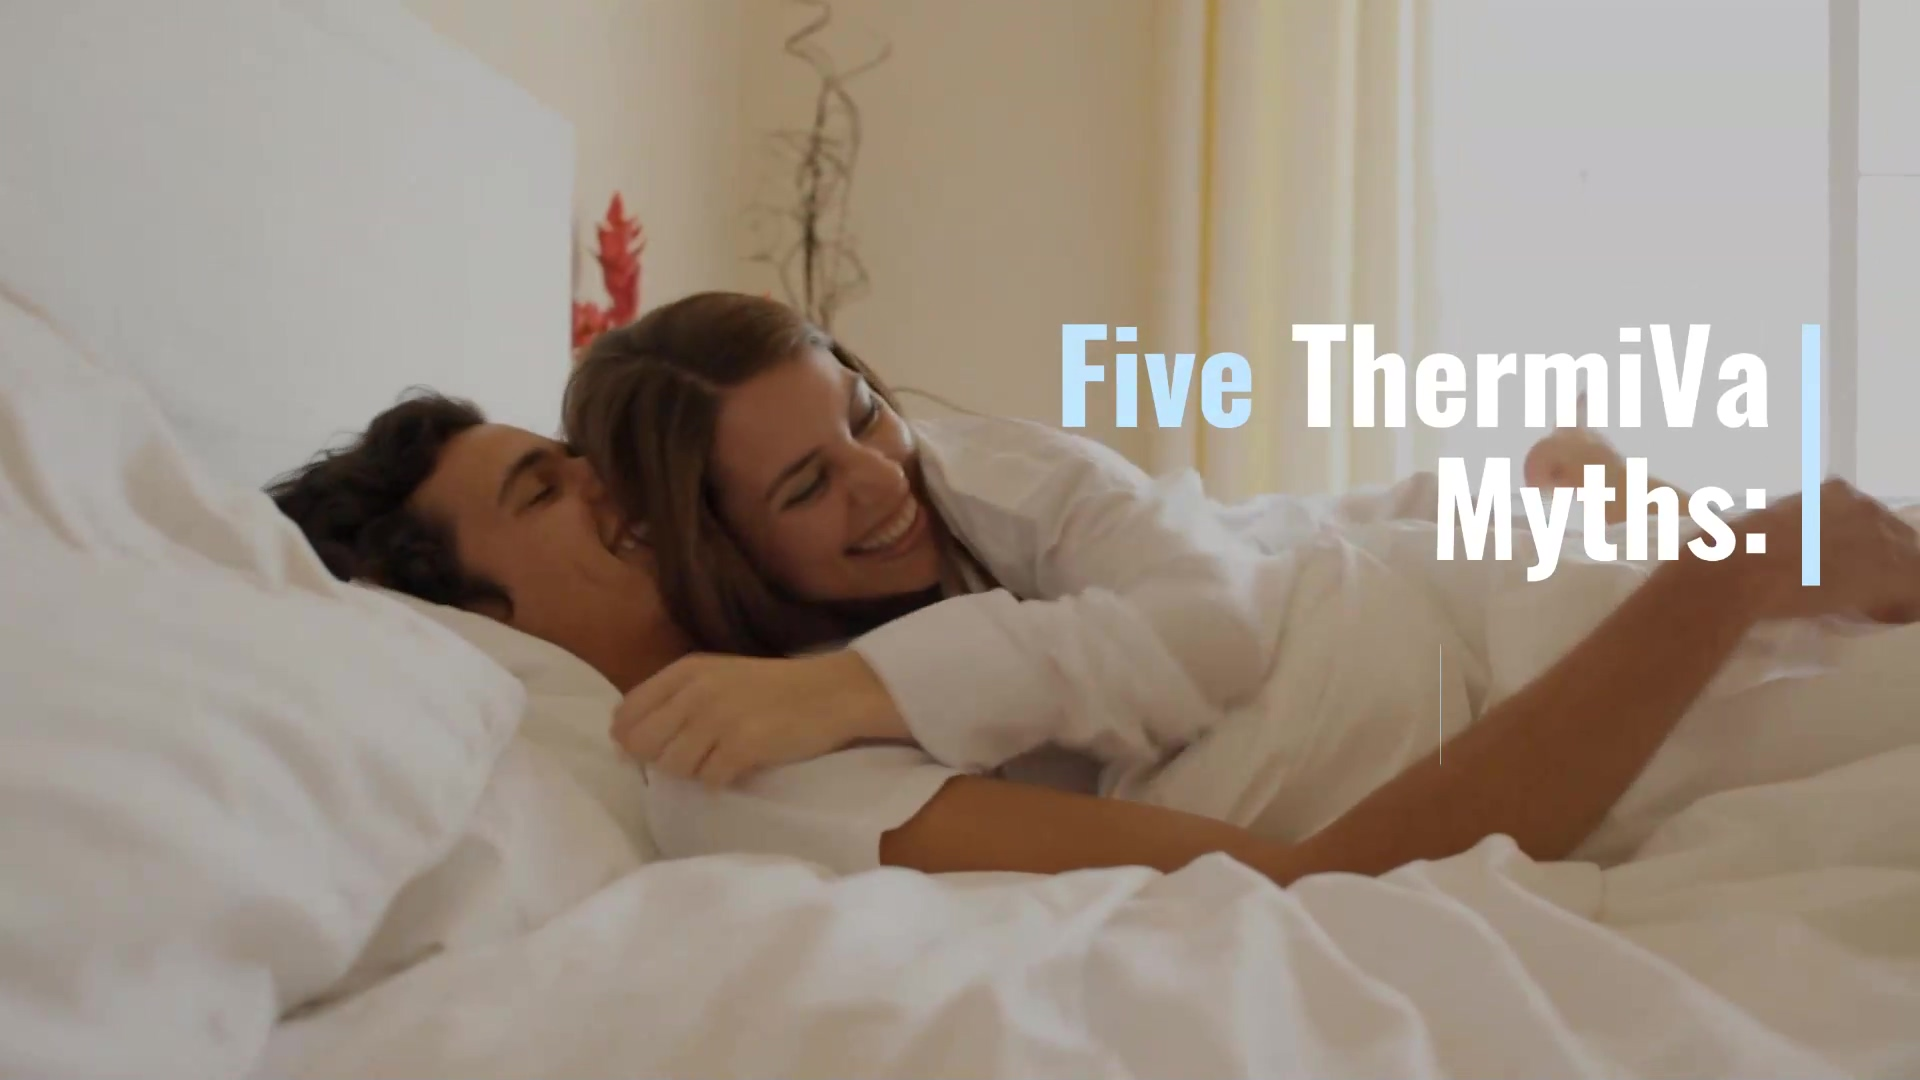 thermiva-myths(resurge)